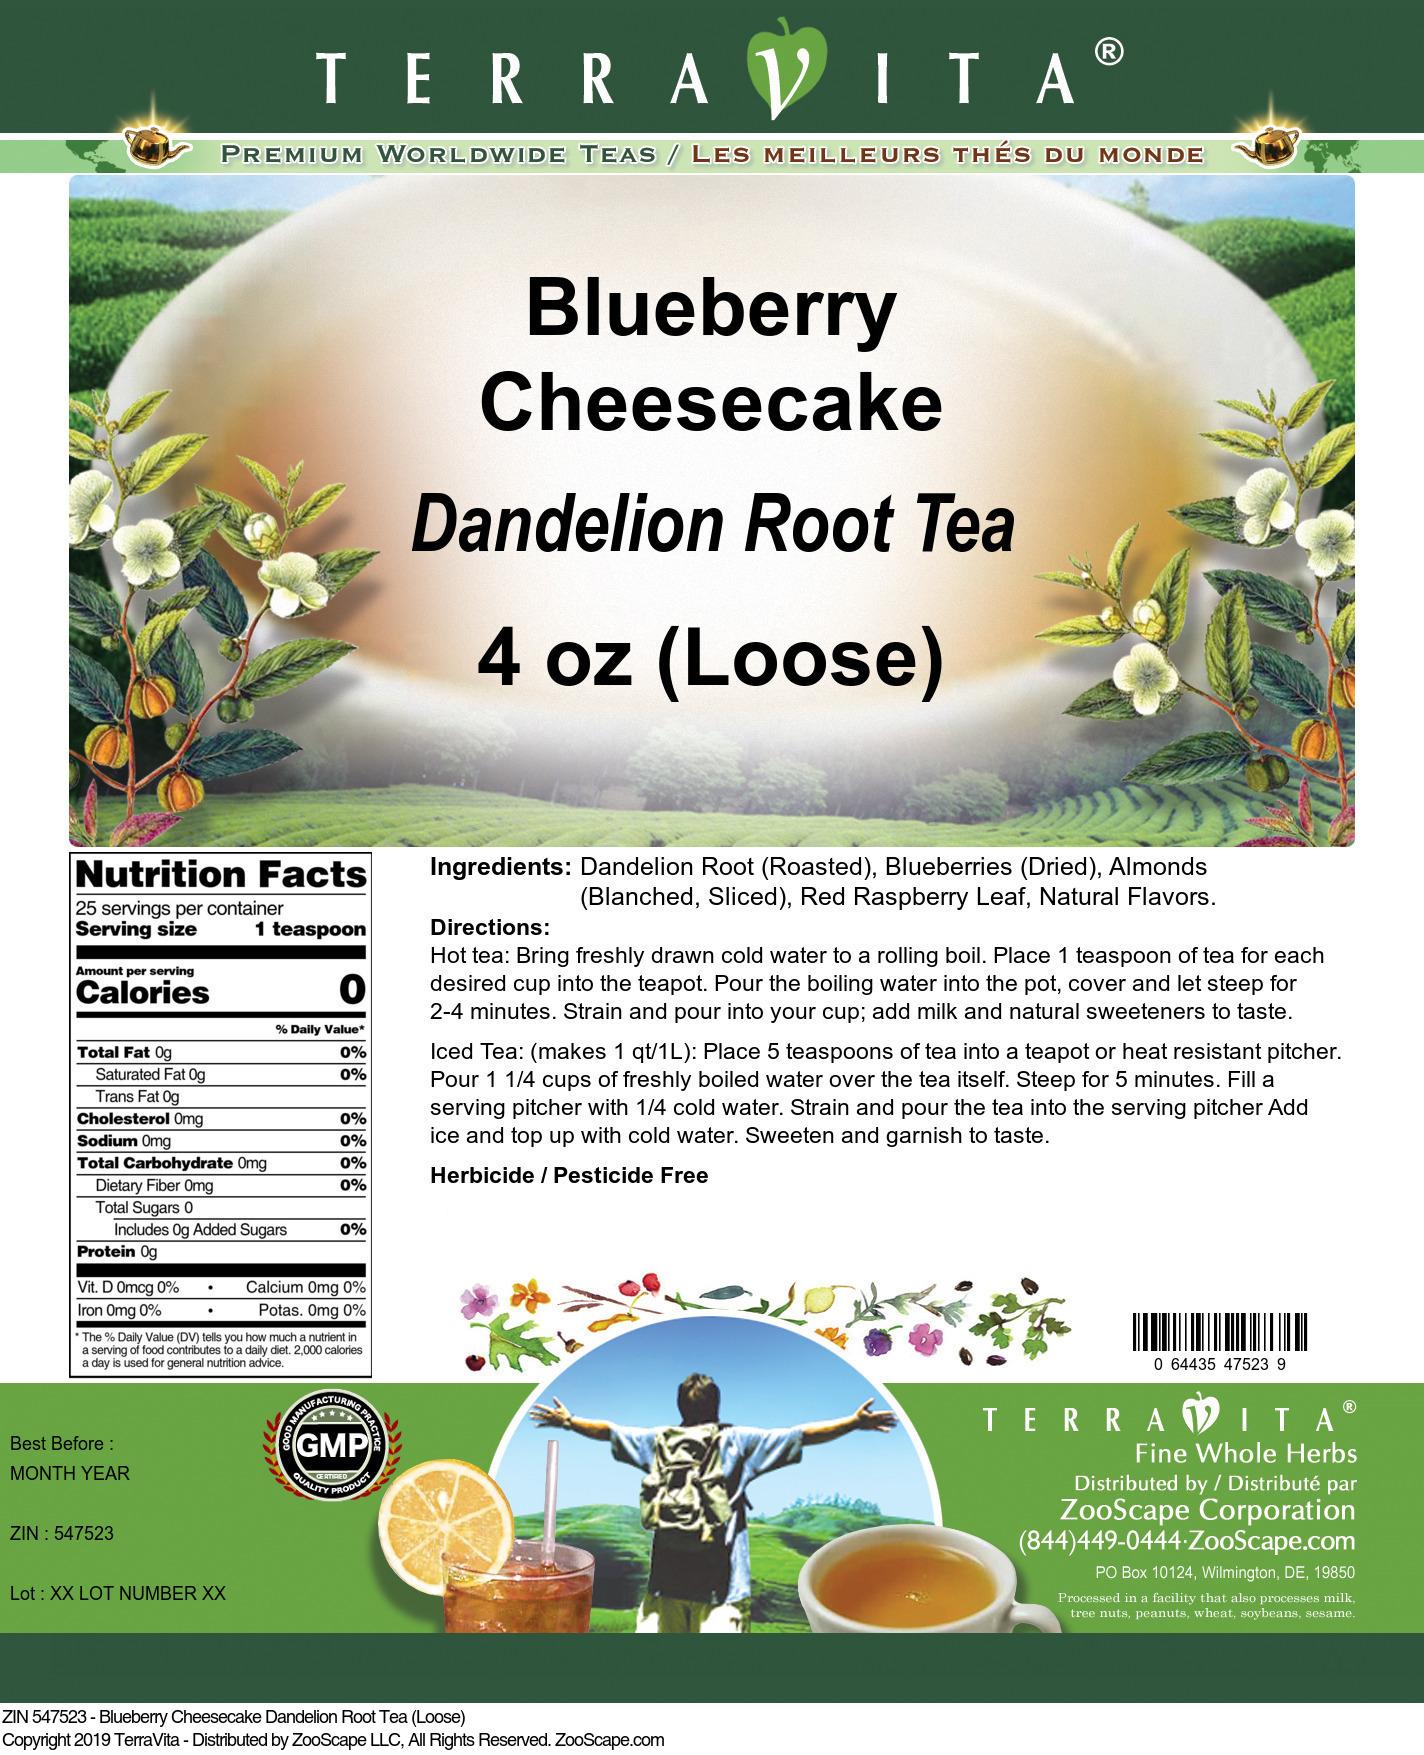 Blueberry Cheesecake Dandelion Root